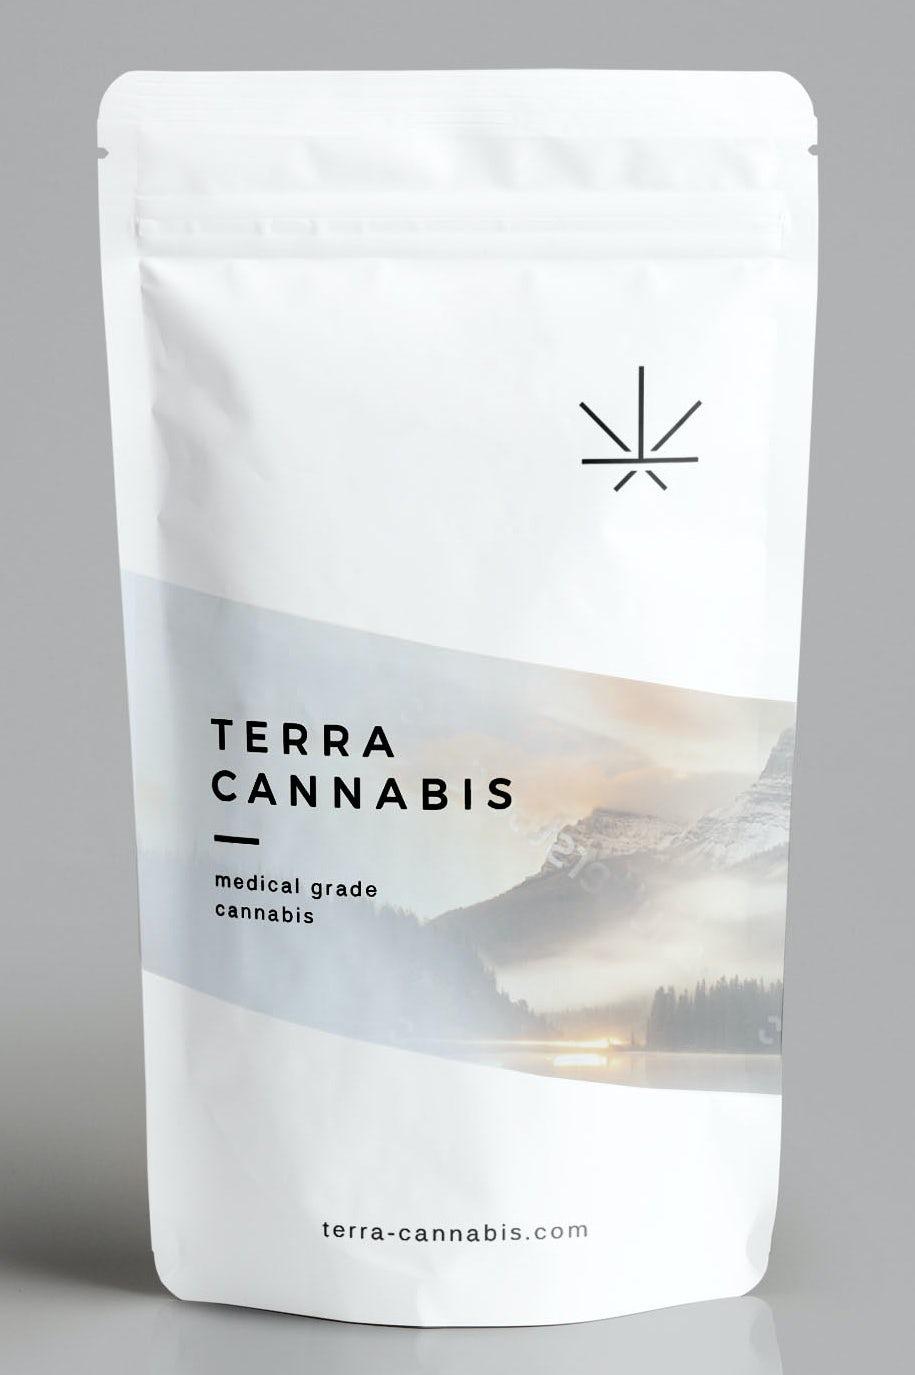 Japanese cannabis pouch design